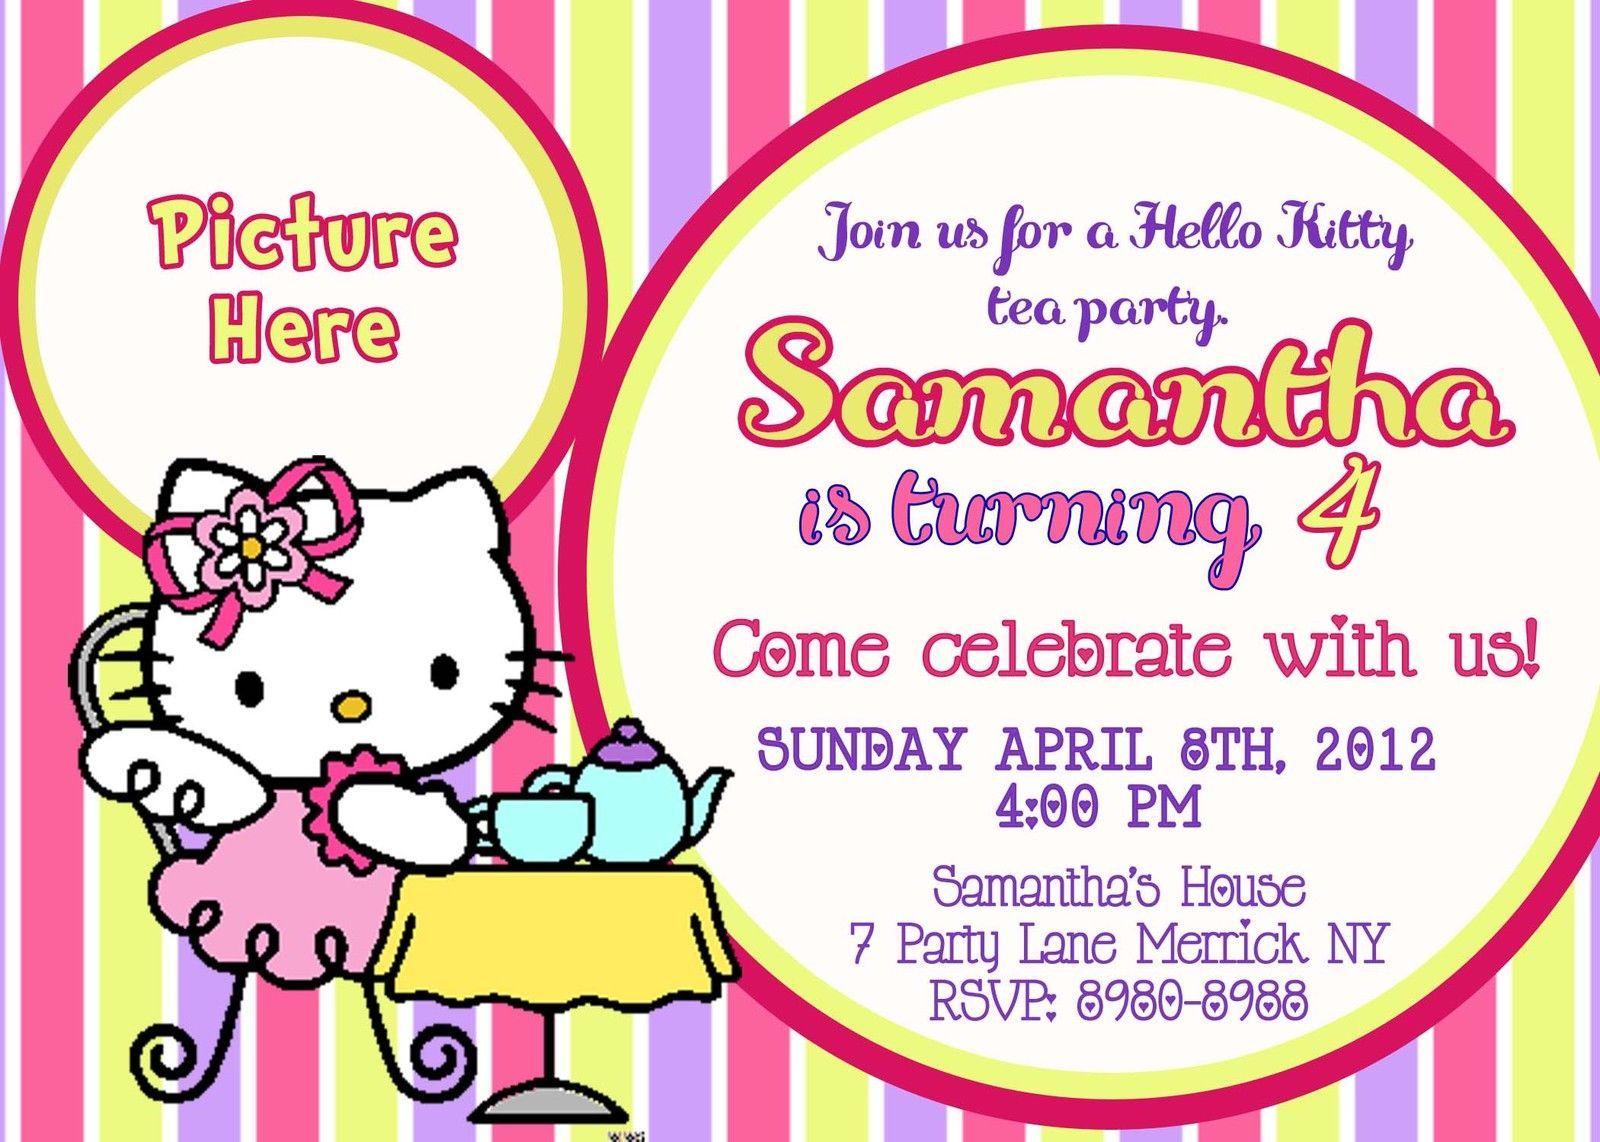 Free printable hello kitty birthday party invitations hello kitty tea party hello kitty birthday invitations filmwisefo